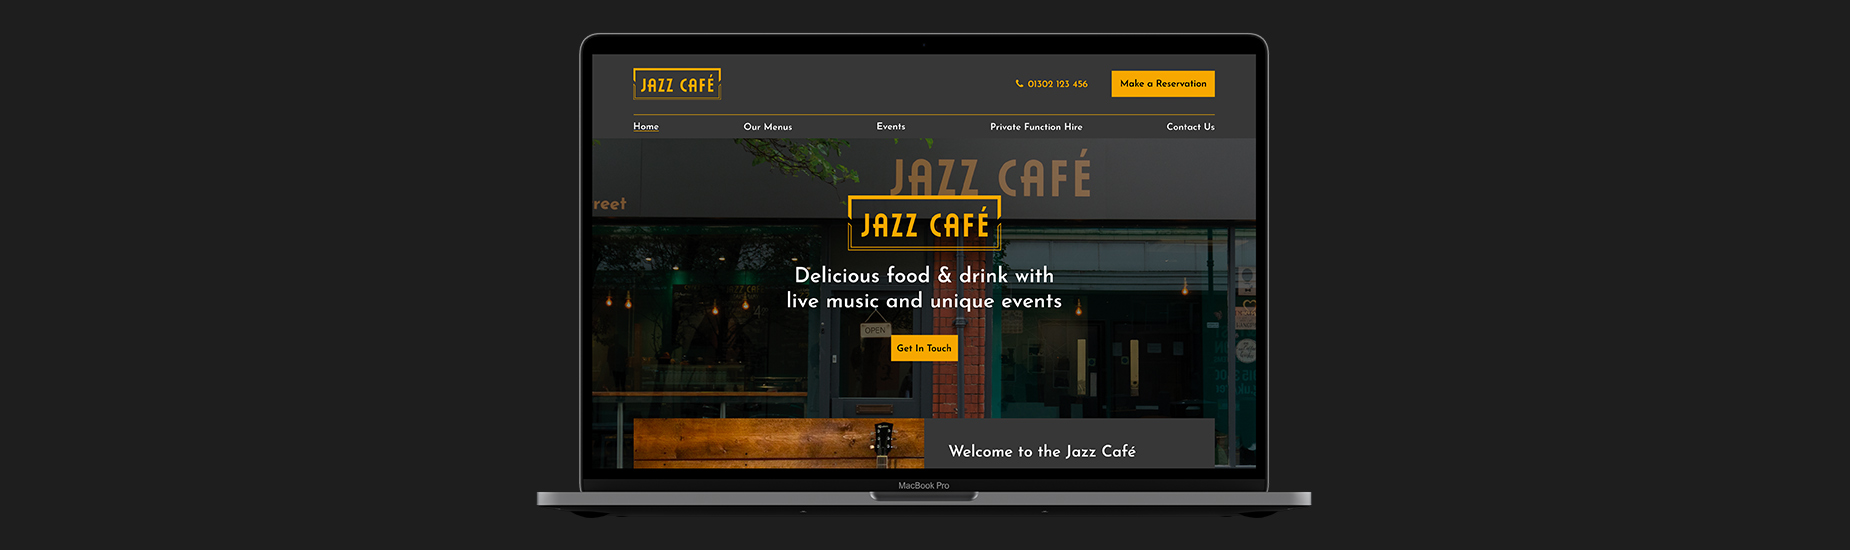 Jazz Cafe homepage design